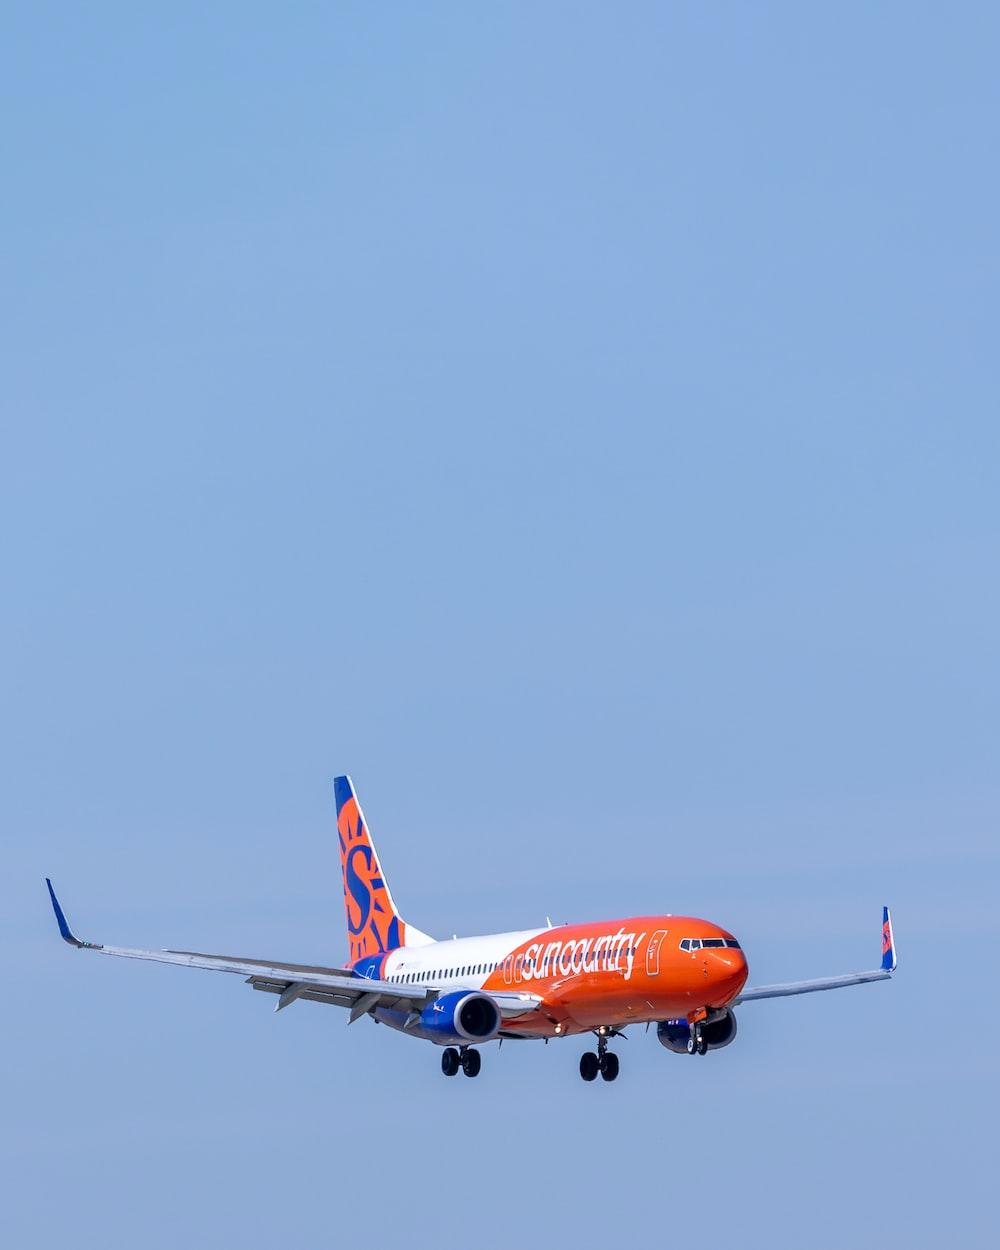 orange and white airplane on flight